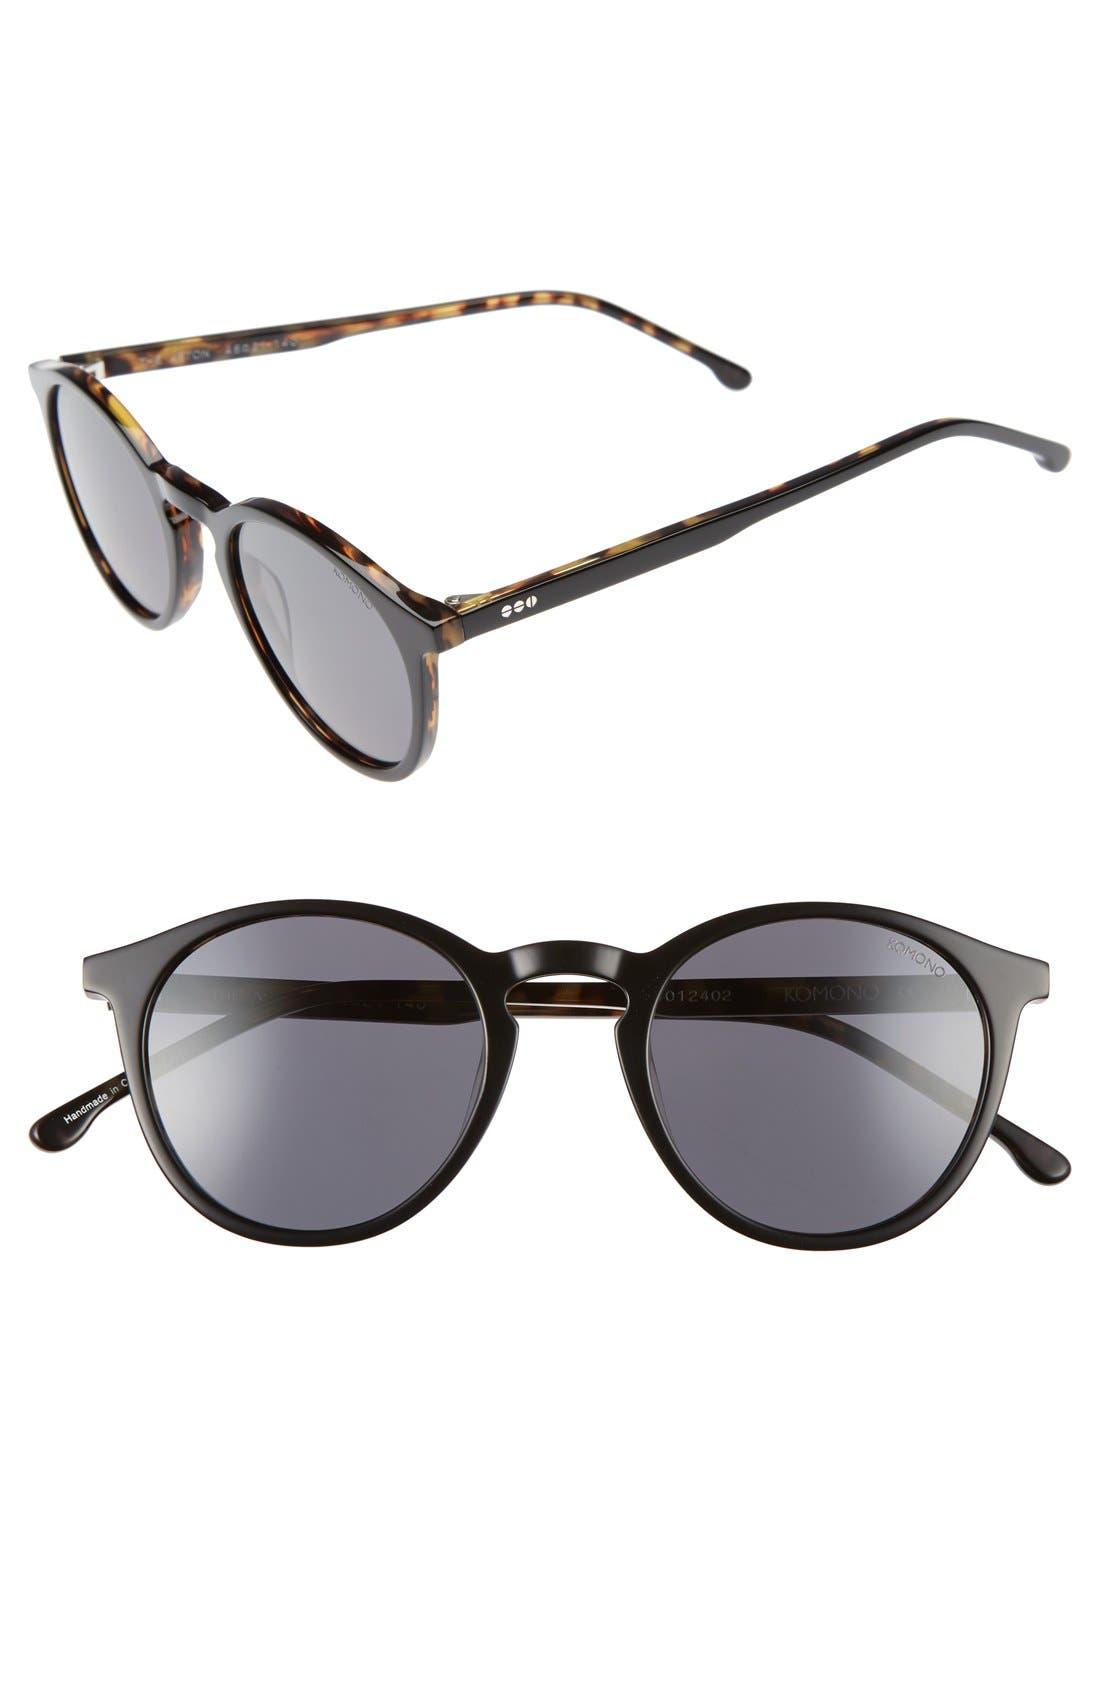 Aston 48mm Round Sunglasses,                             Main thumbnail 1, color,                             001